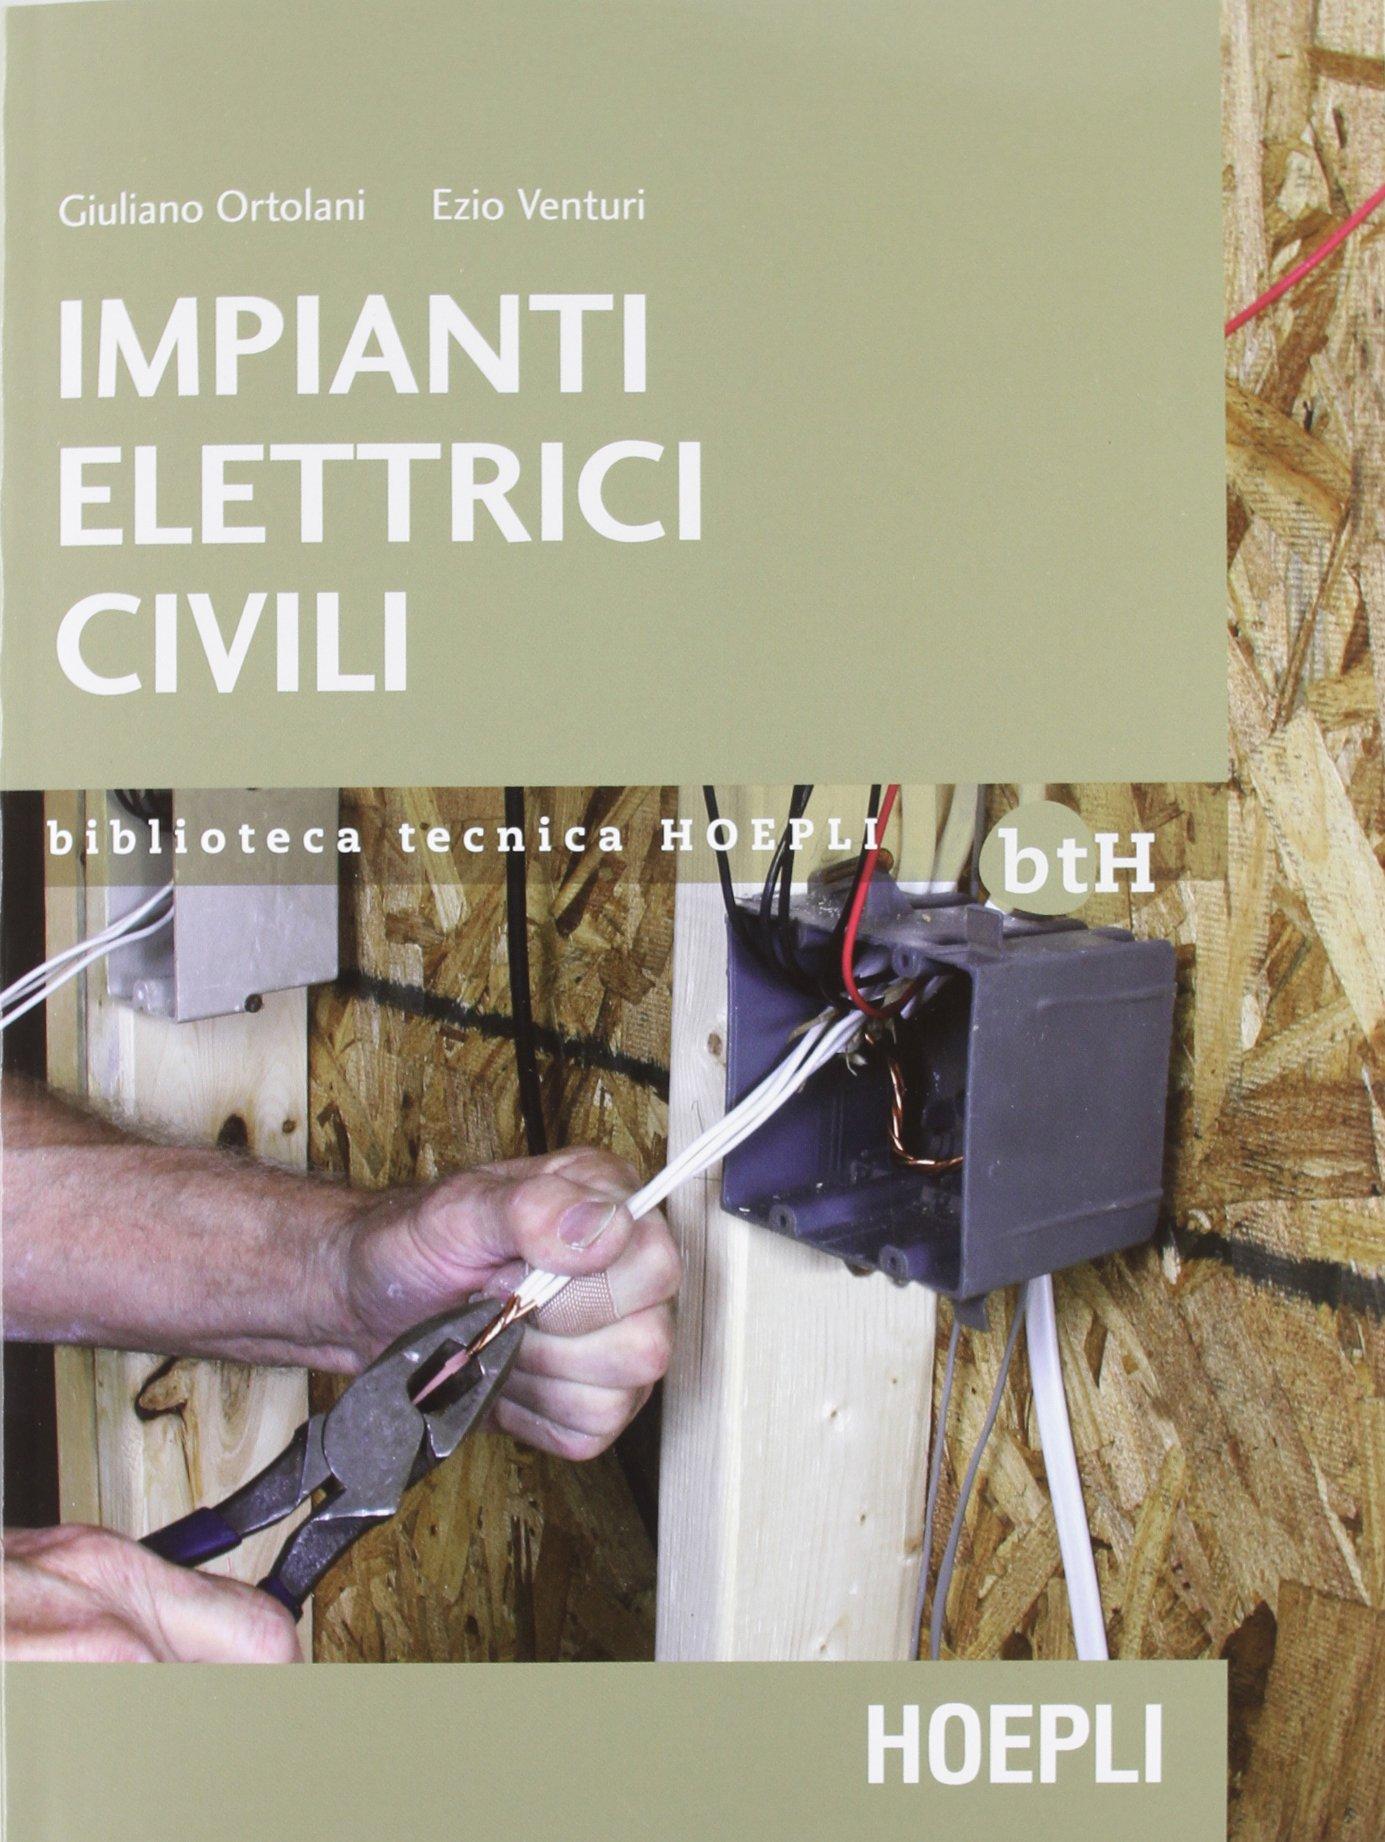 Schemi Elettrici Ne : Vmf sit manuale di installazione installation manual manuel d